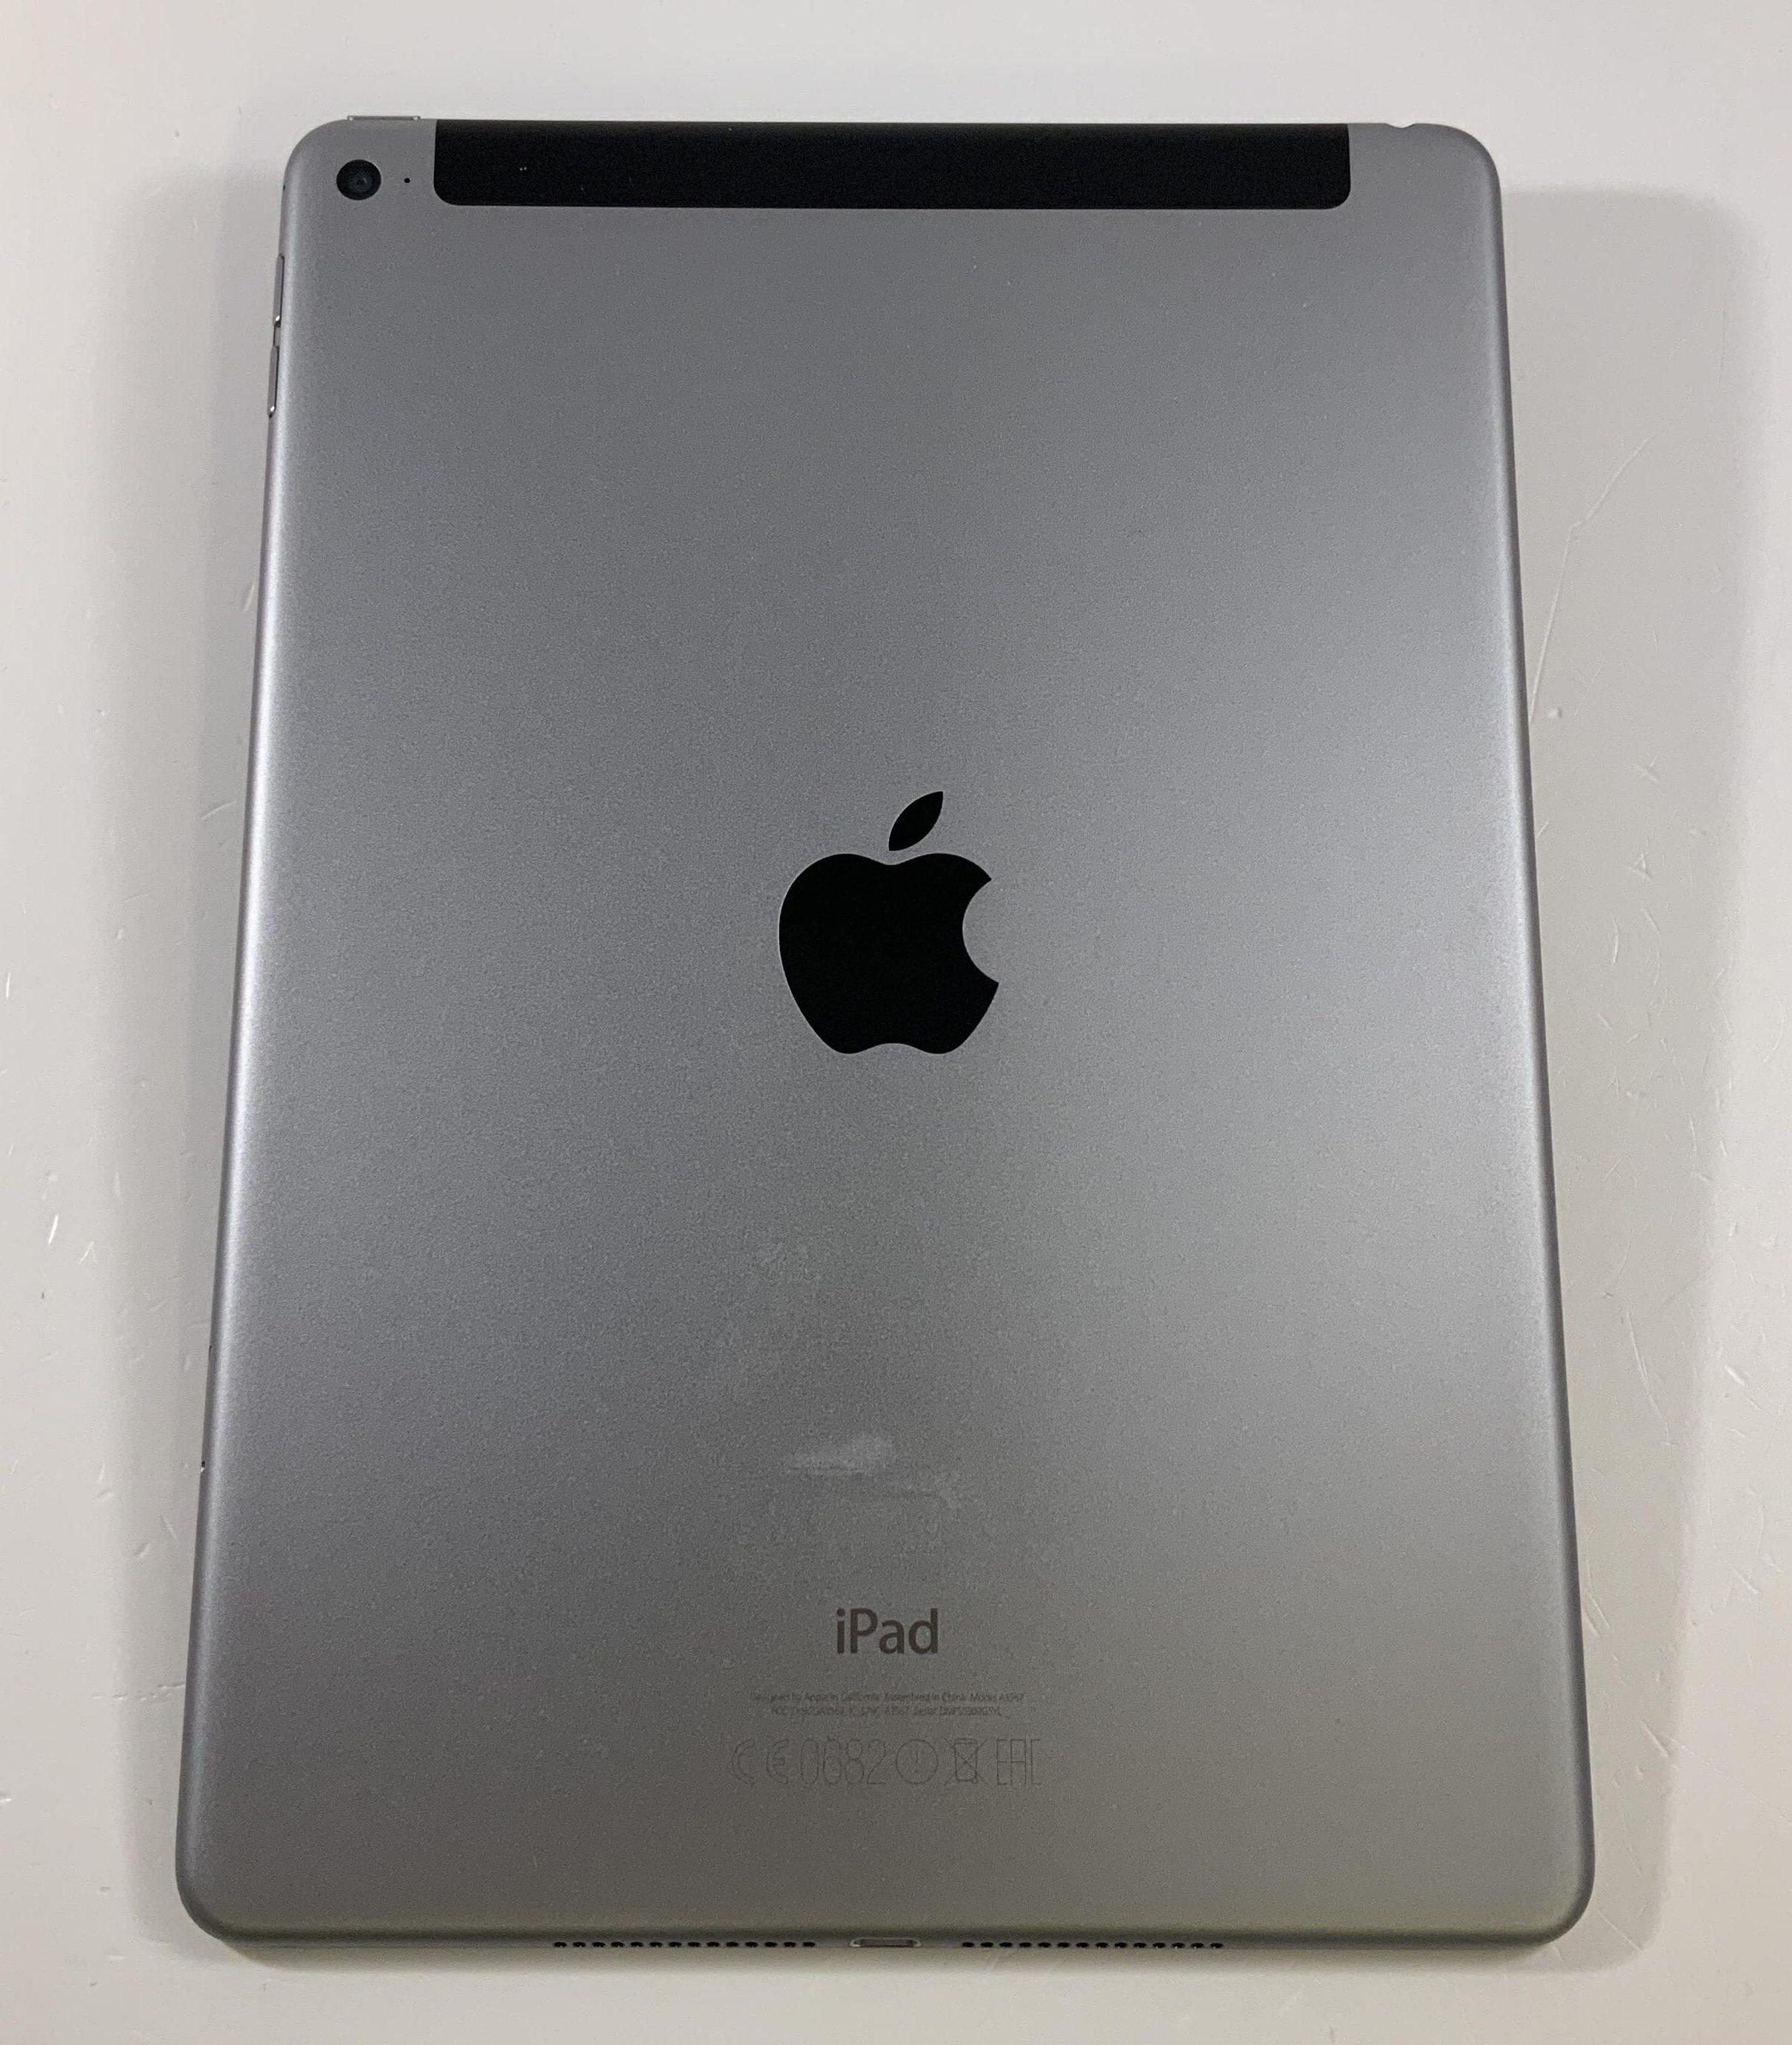 iPad Air 2 Wi-Fi + Cellular 64GB, 64GB, Space Gray, Kuva 2